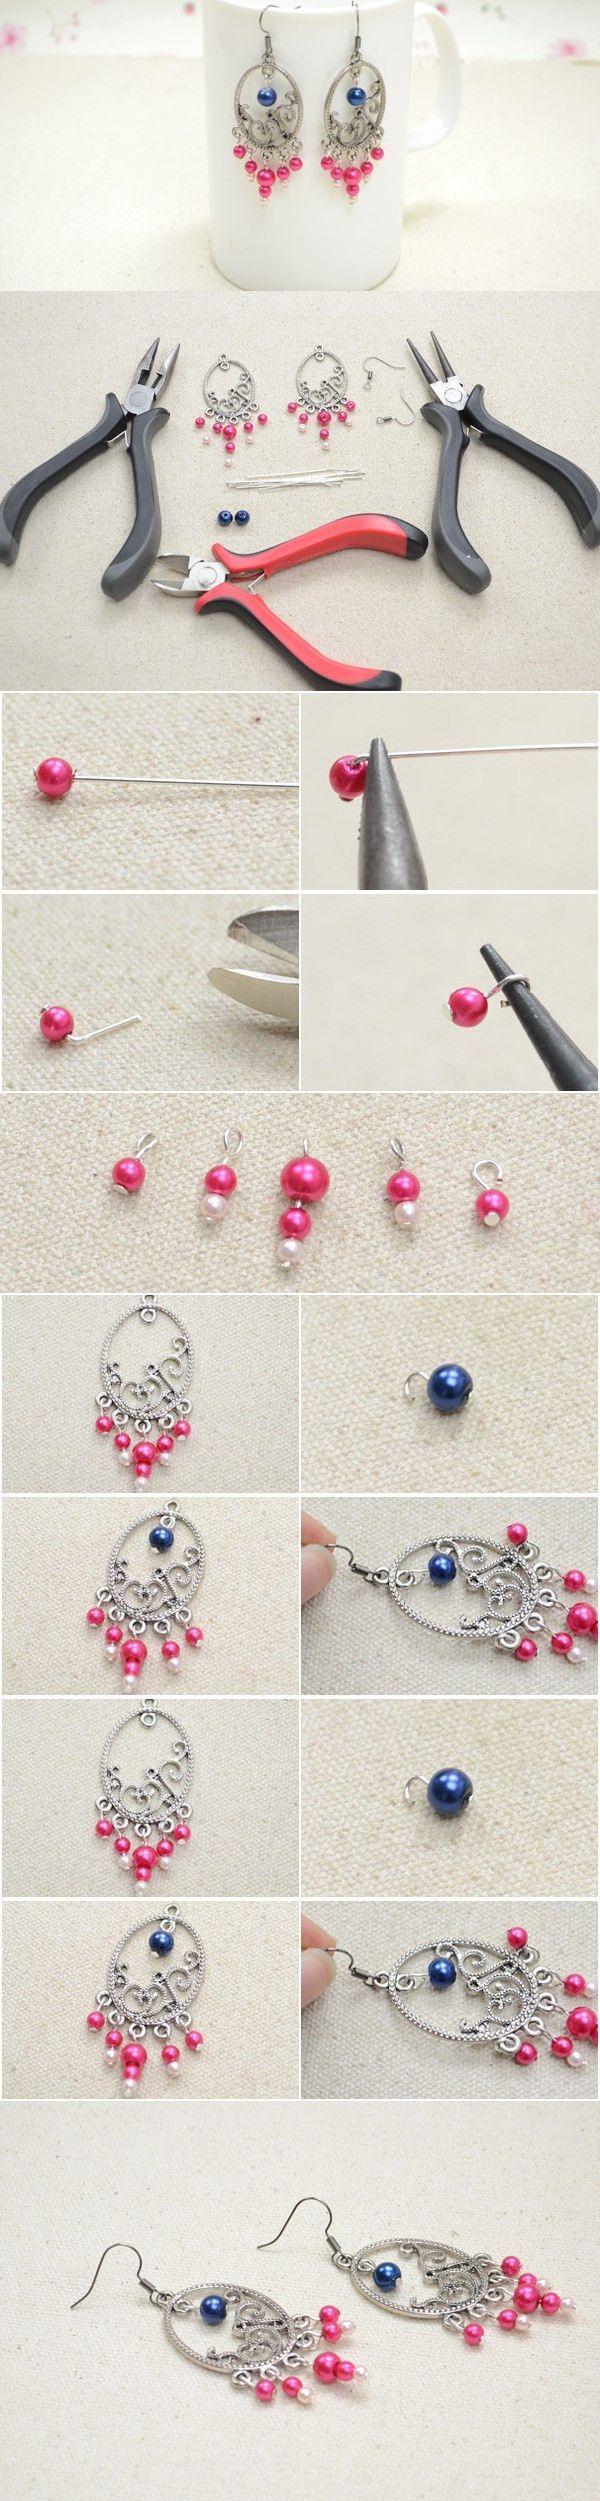 Diy pearl beaded chandelier earrings dangle earrings pinterest diy pearl beaded chandelier earrings arubaitofo Image collections